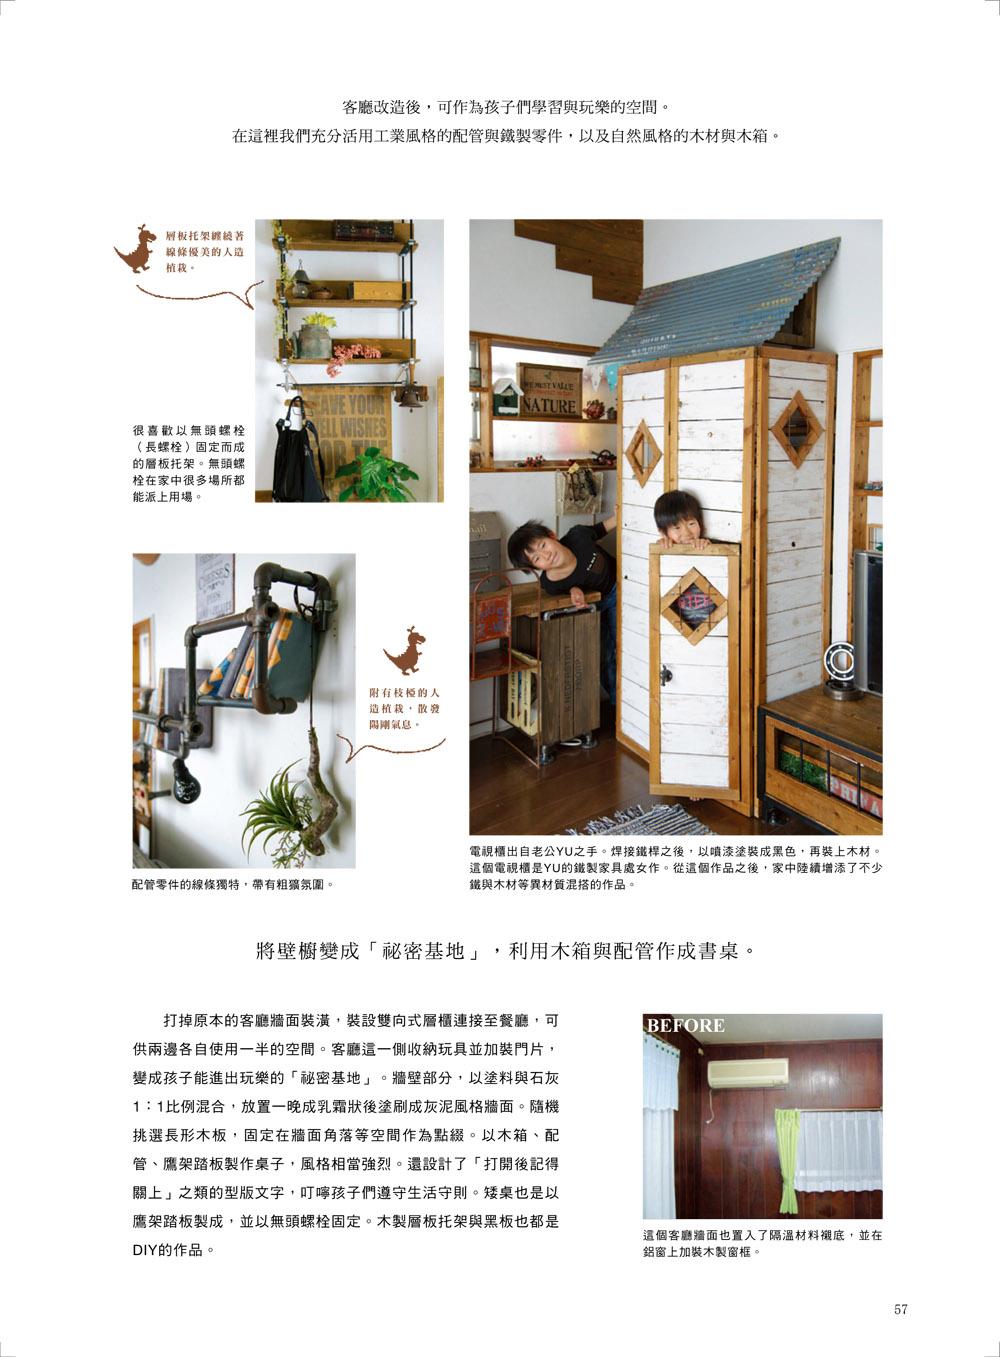 DIY+GREEN自宅改造綠色家居